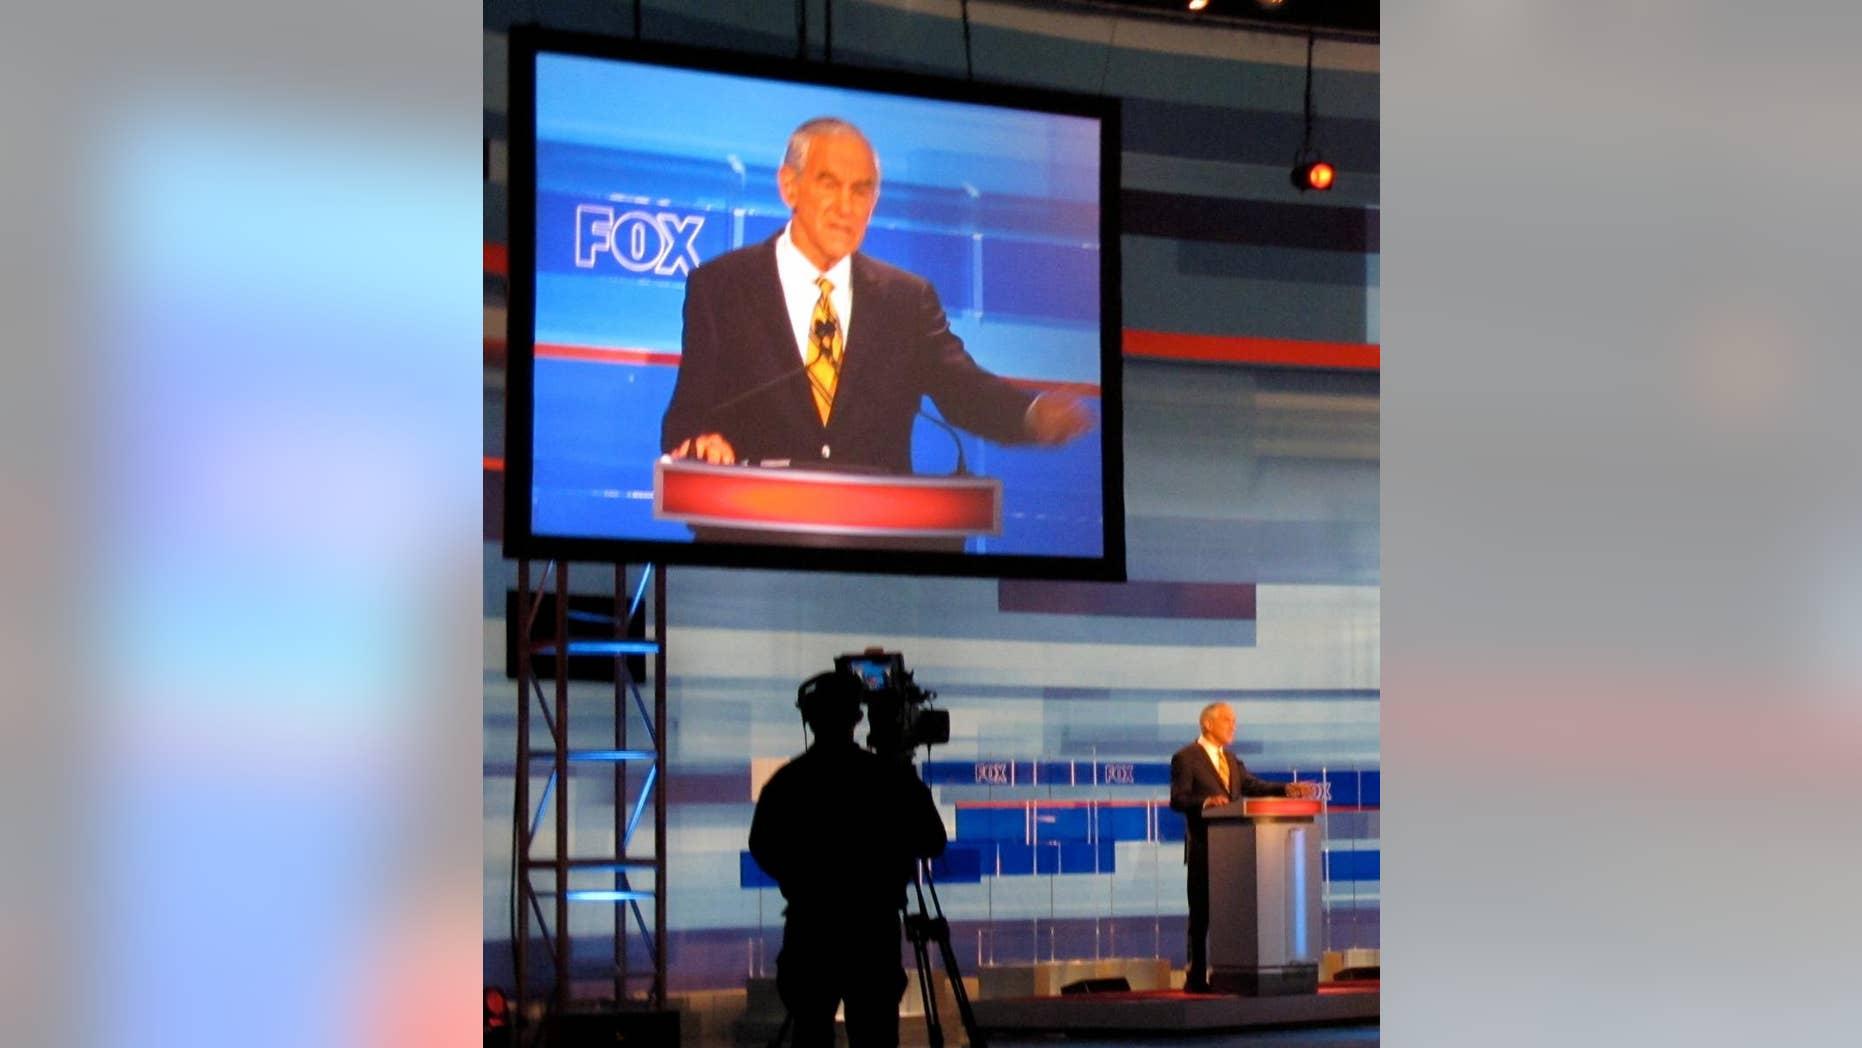 Texas Rep. Ron Paul gestures during a FOX News/South Carolina GOP debate Thursday, May 5 in Greenville. (Fox News Photo)